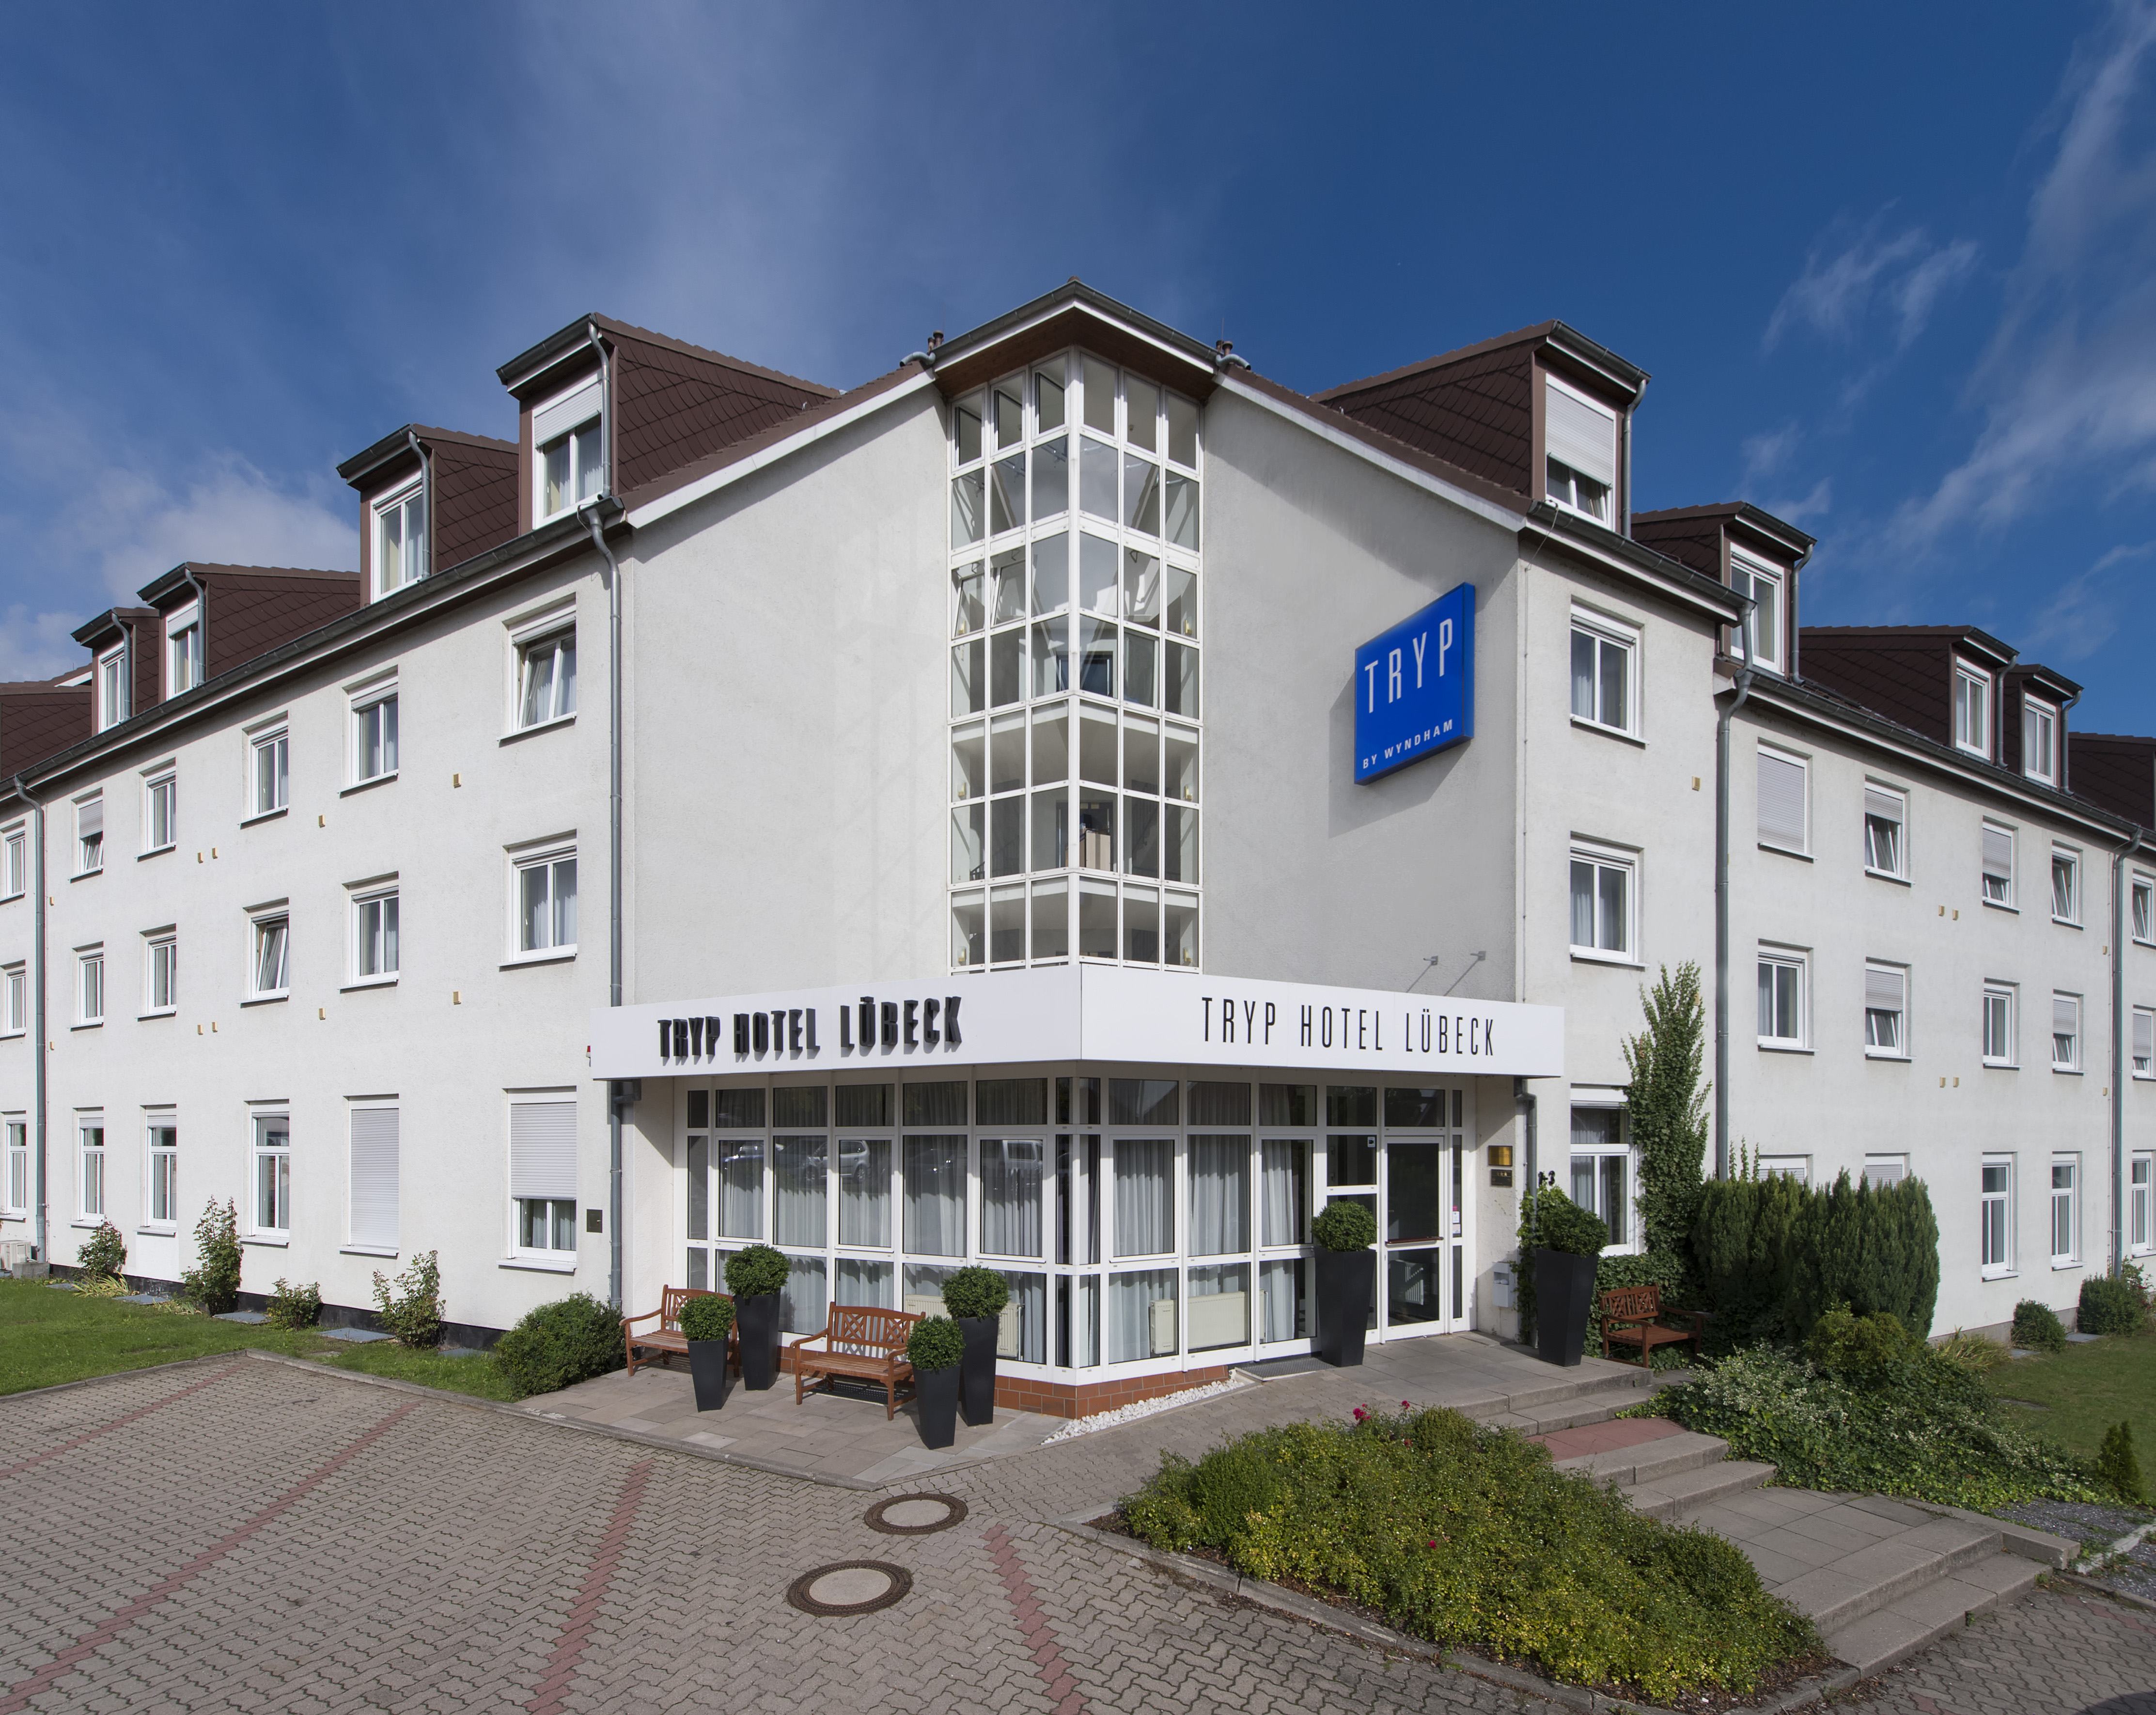 Hotel Ibis City Lubeck